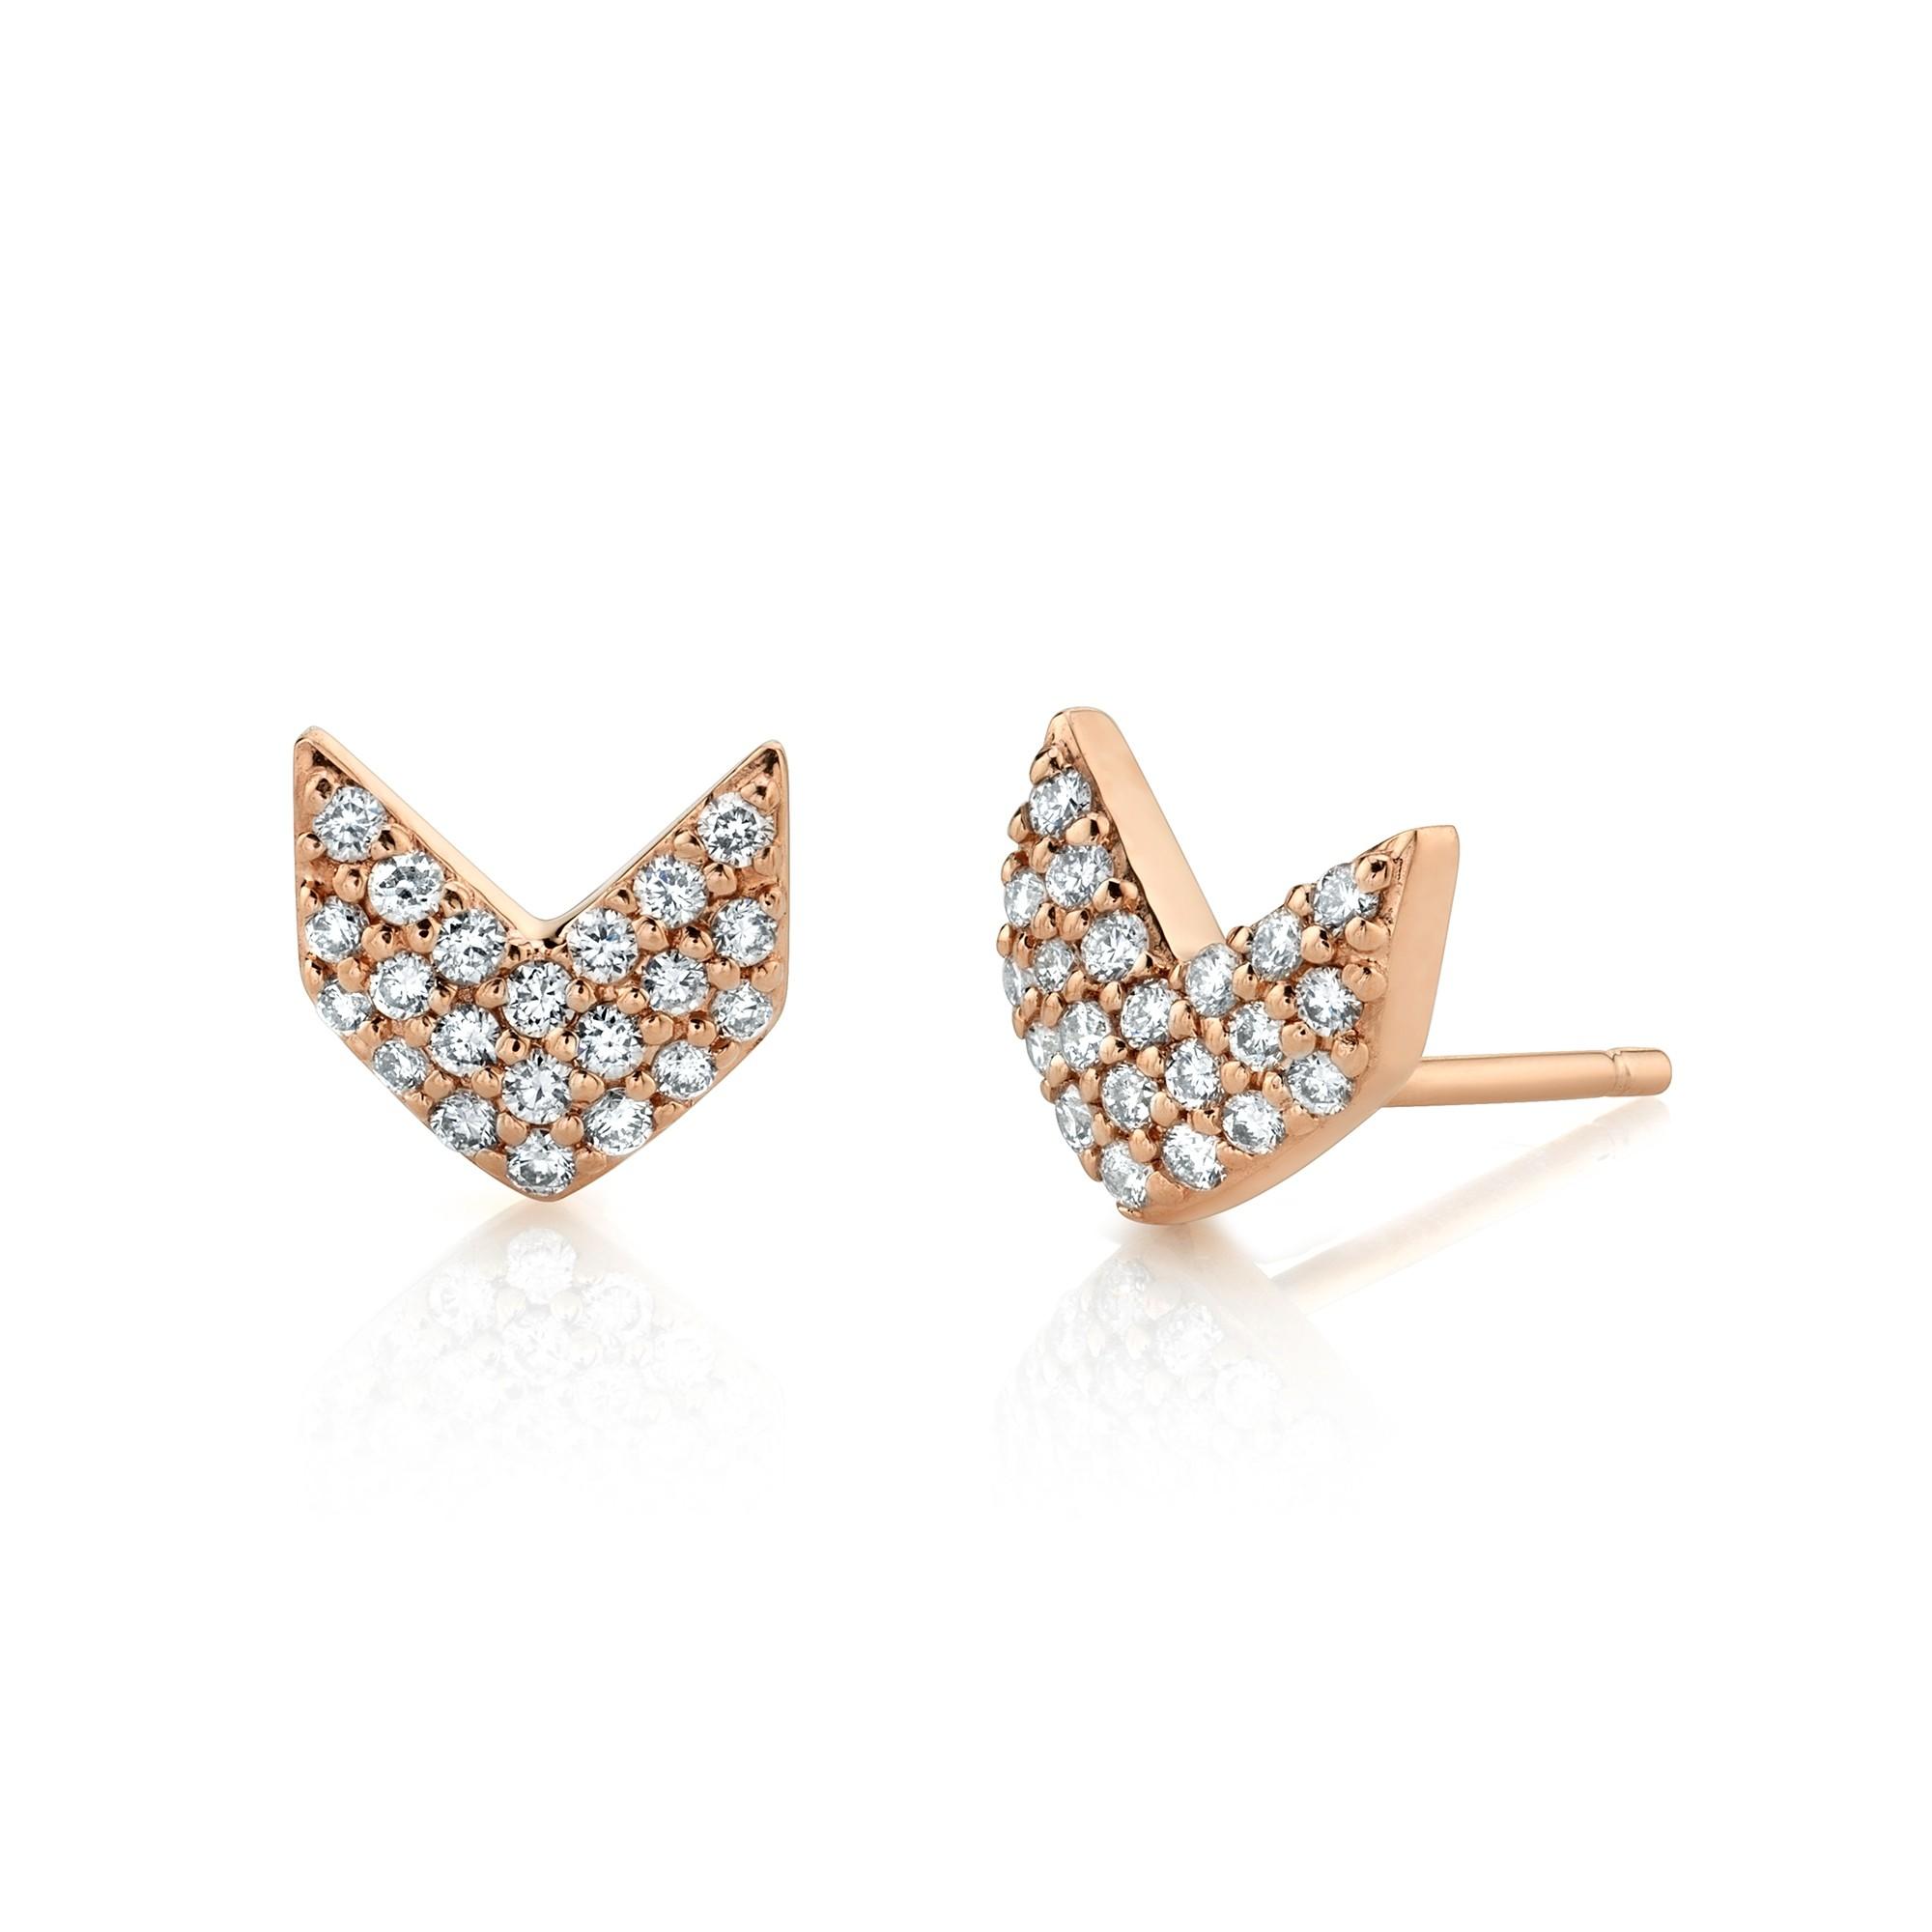 14k Rose Gold Diamond Pave Chevron Earrings